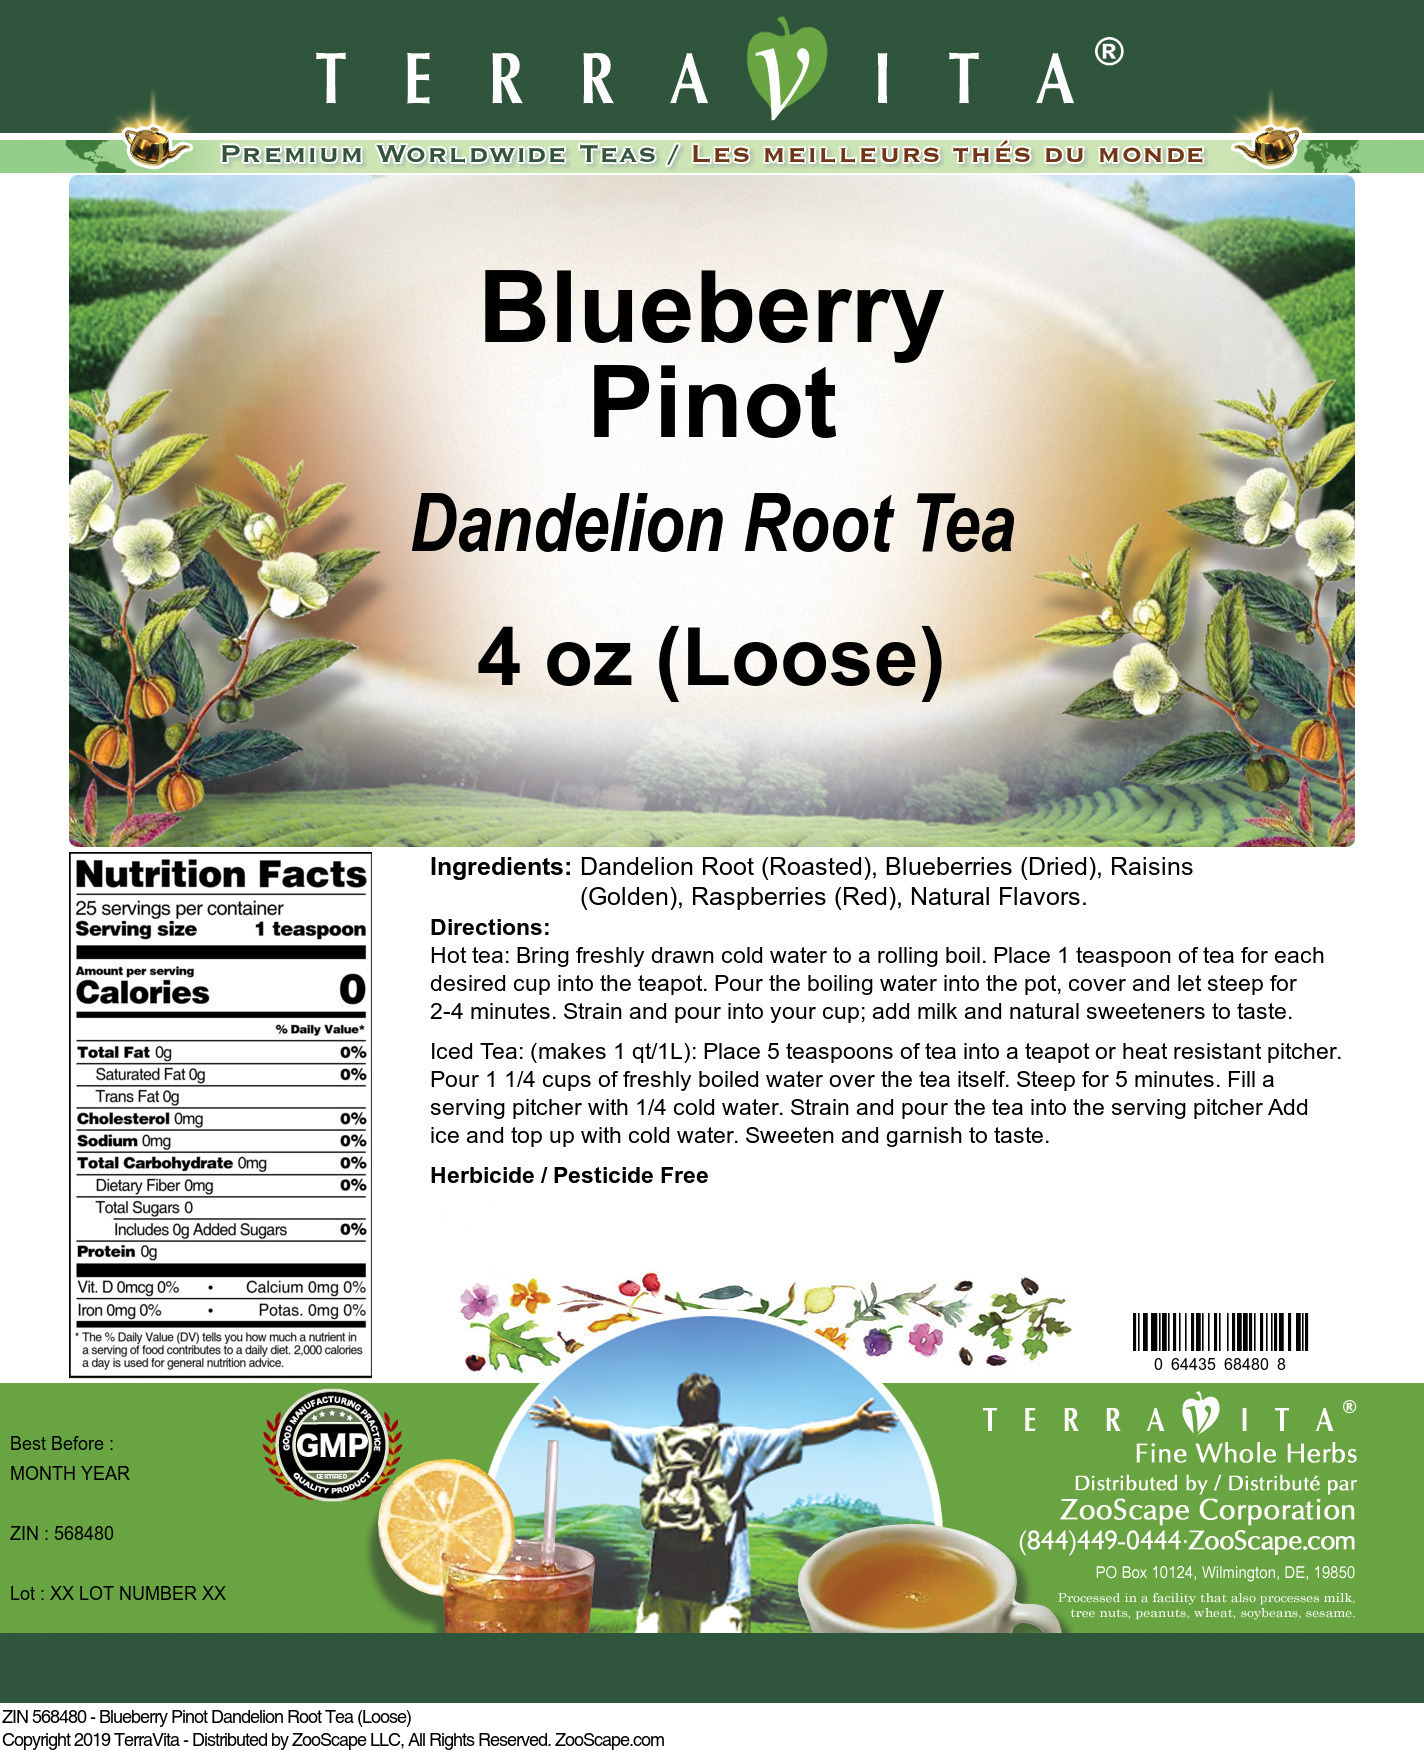 Blueberry Pinot Dandelion Root Tea (Loose)